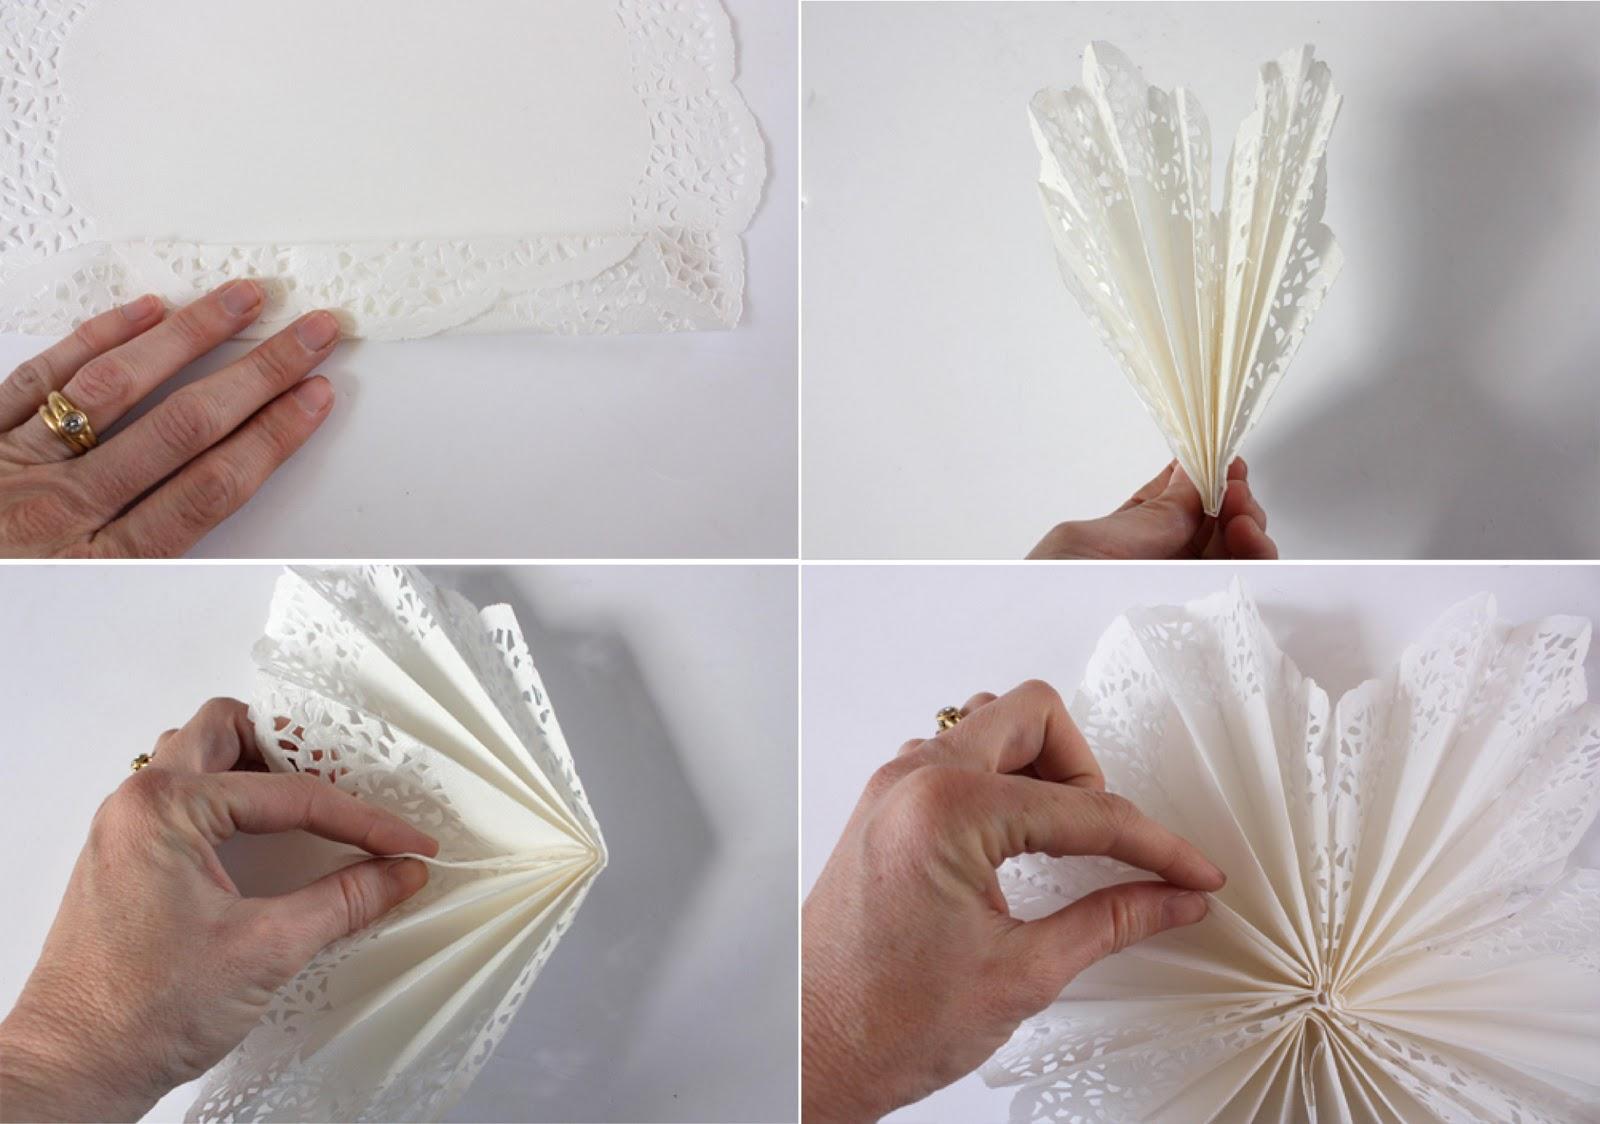 Adornos de navidad con blondas o mantelitos de papel car - Estrellas de papel ...